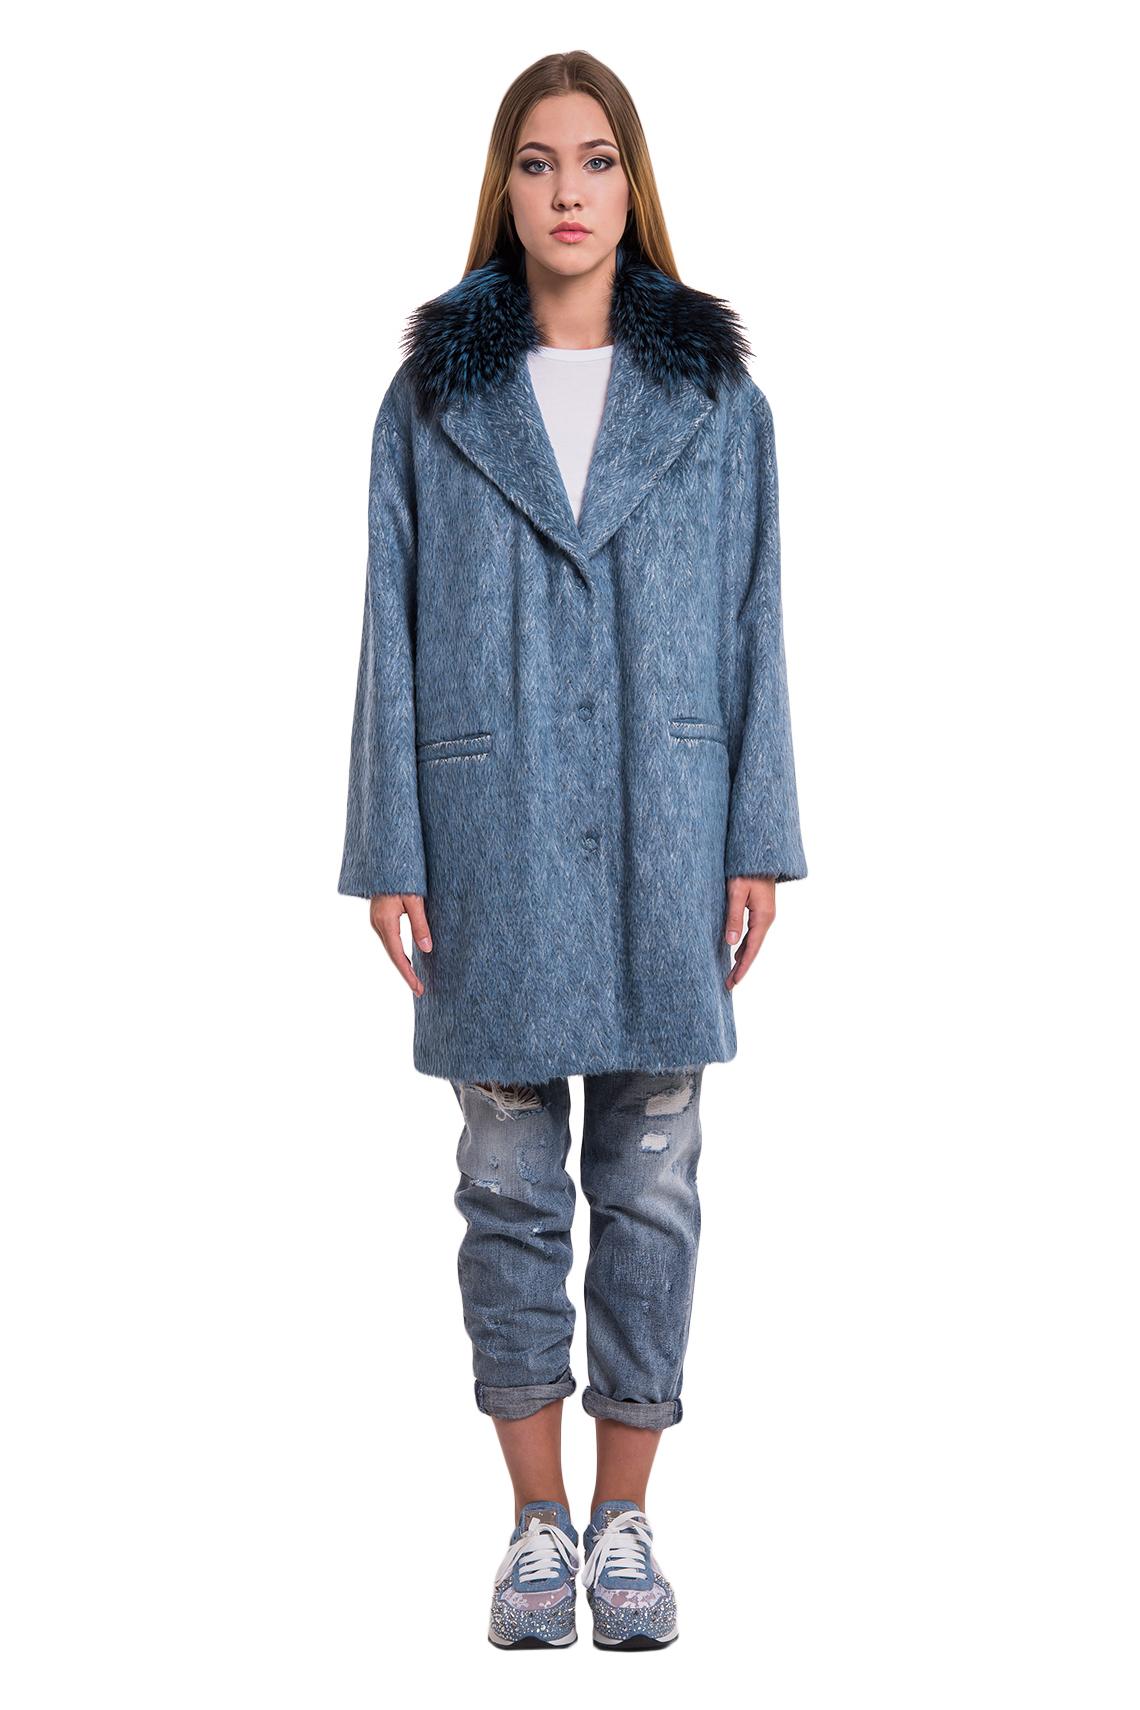 Пальто кашемир/silver fox арт. 17M073. Фото 1